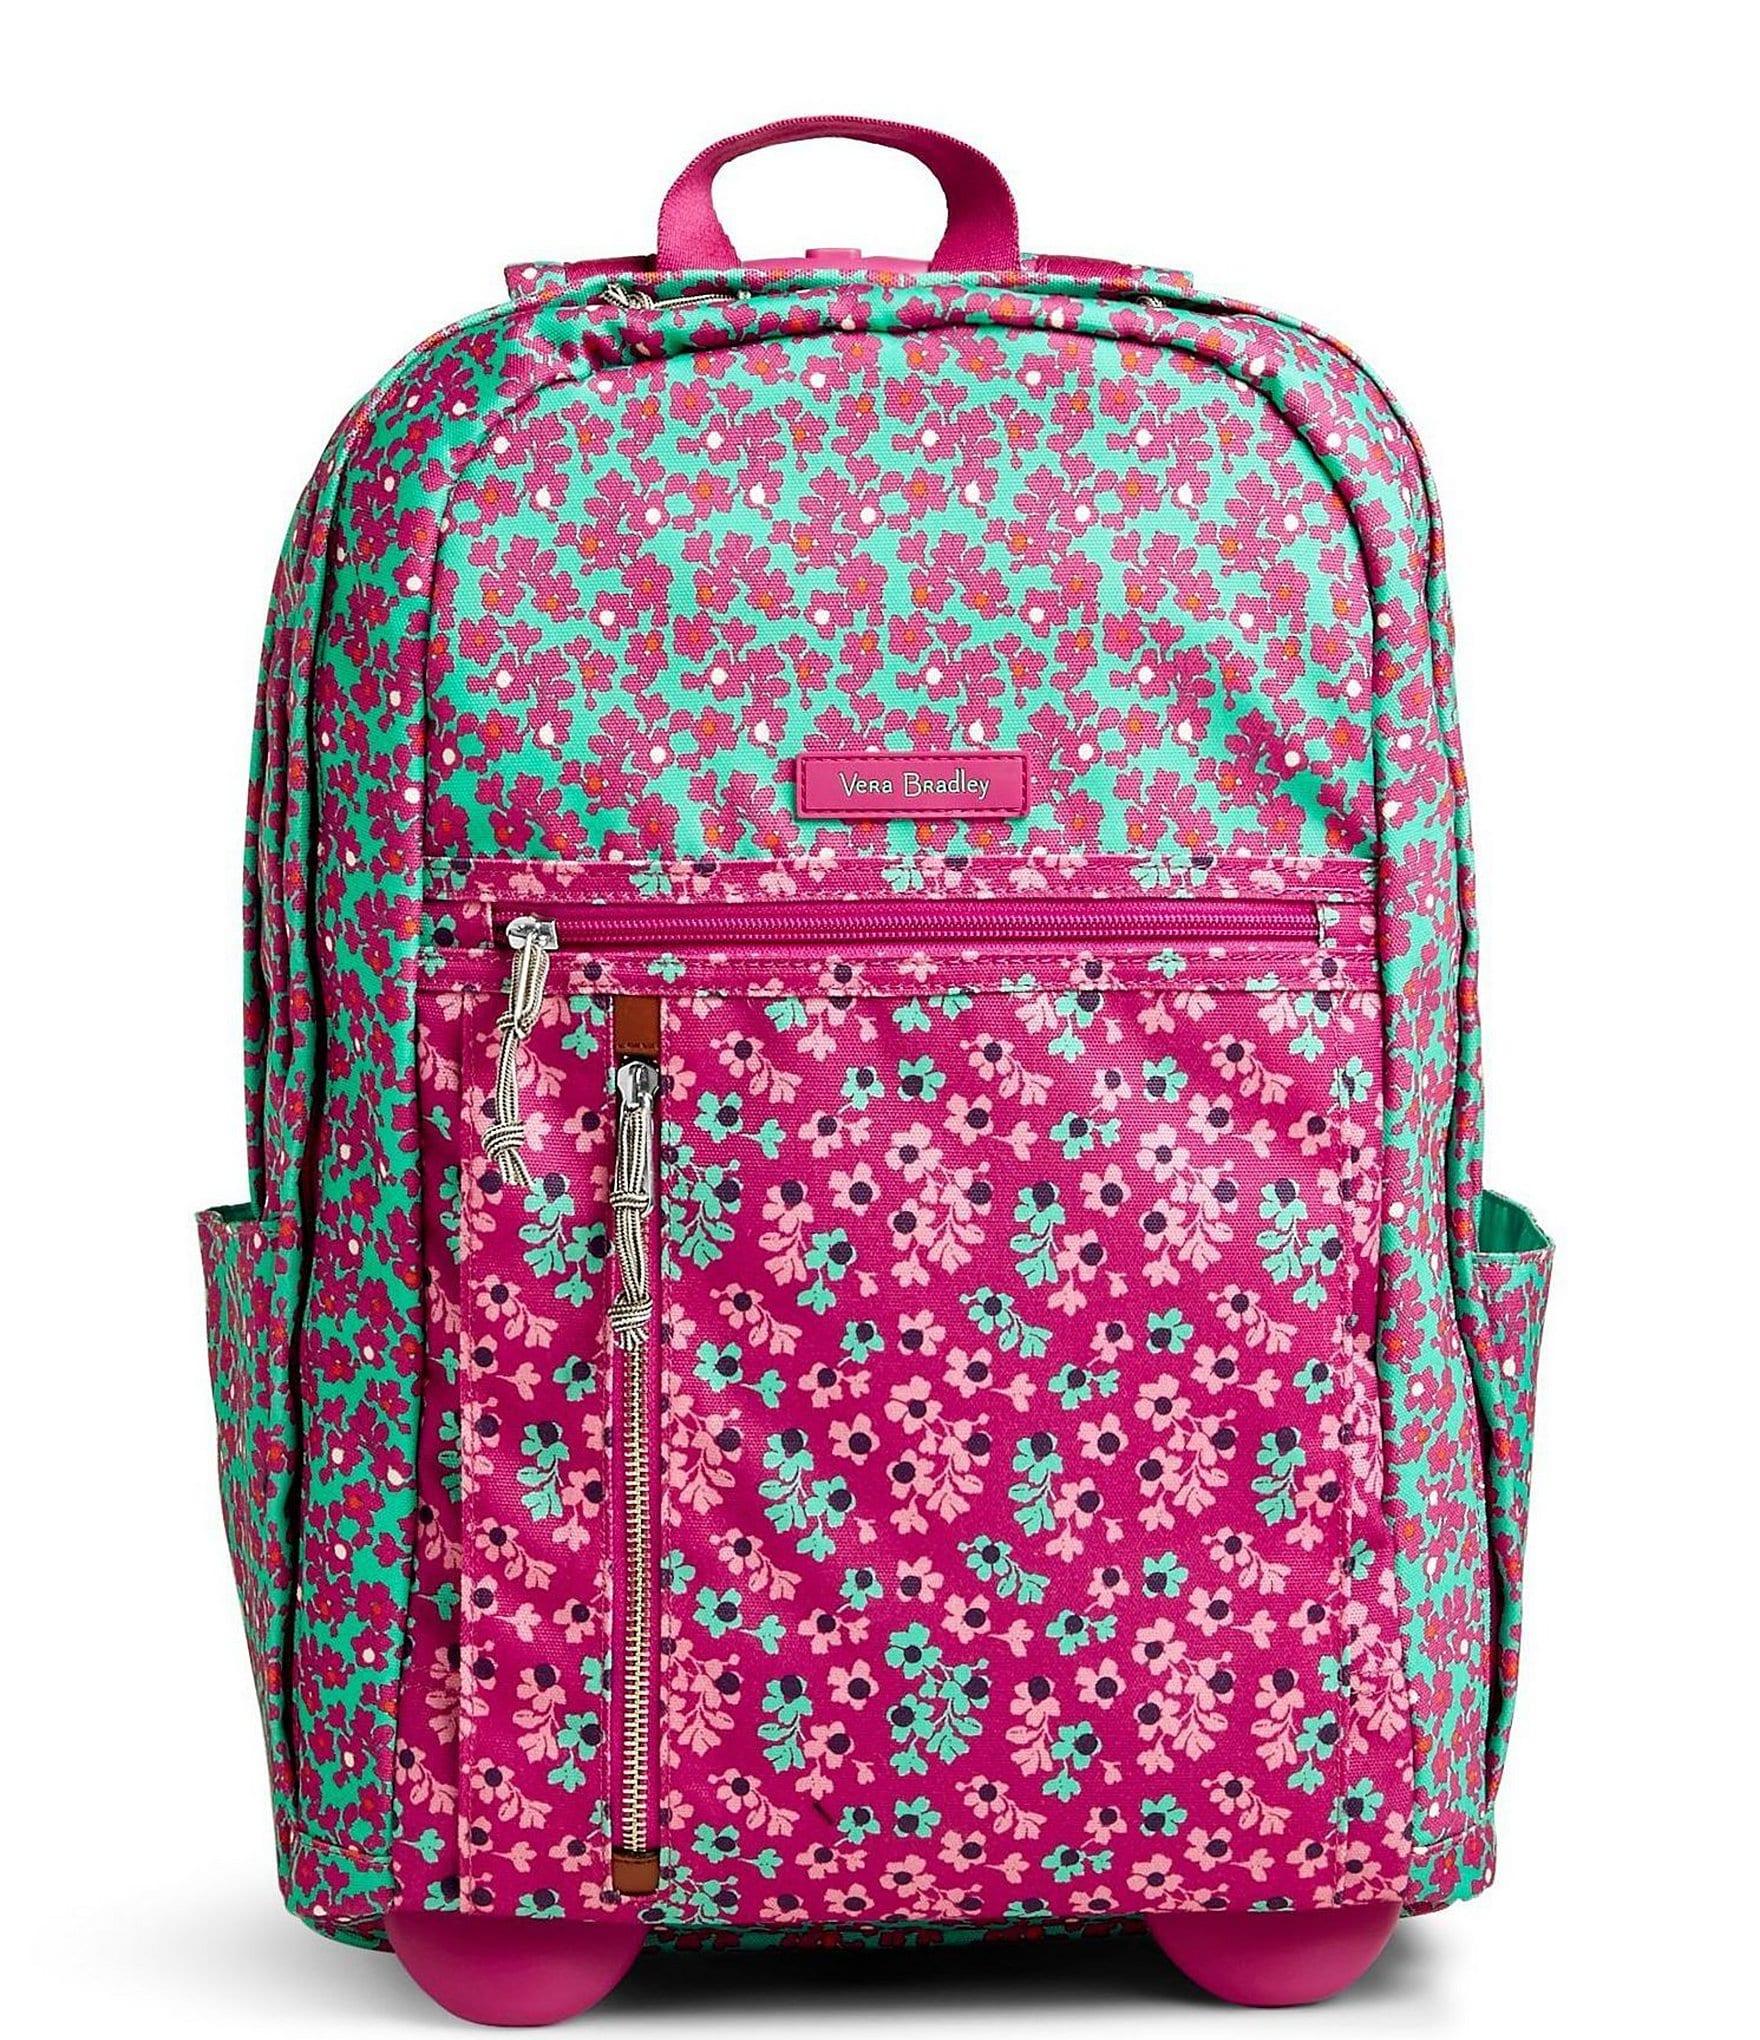 Vera Bradley Lighten Up Rolling Backpack Dillards